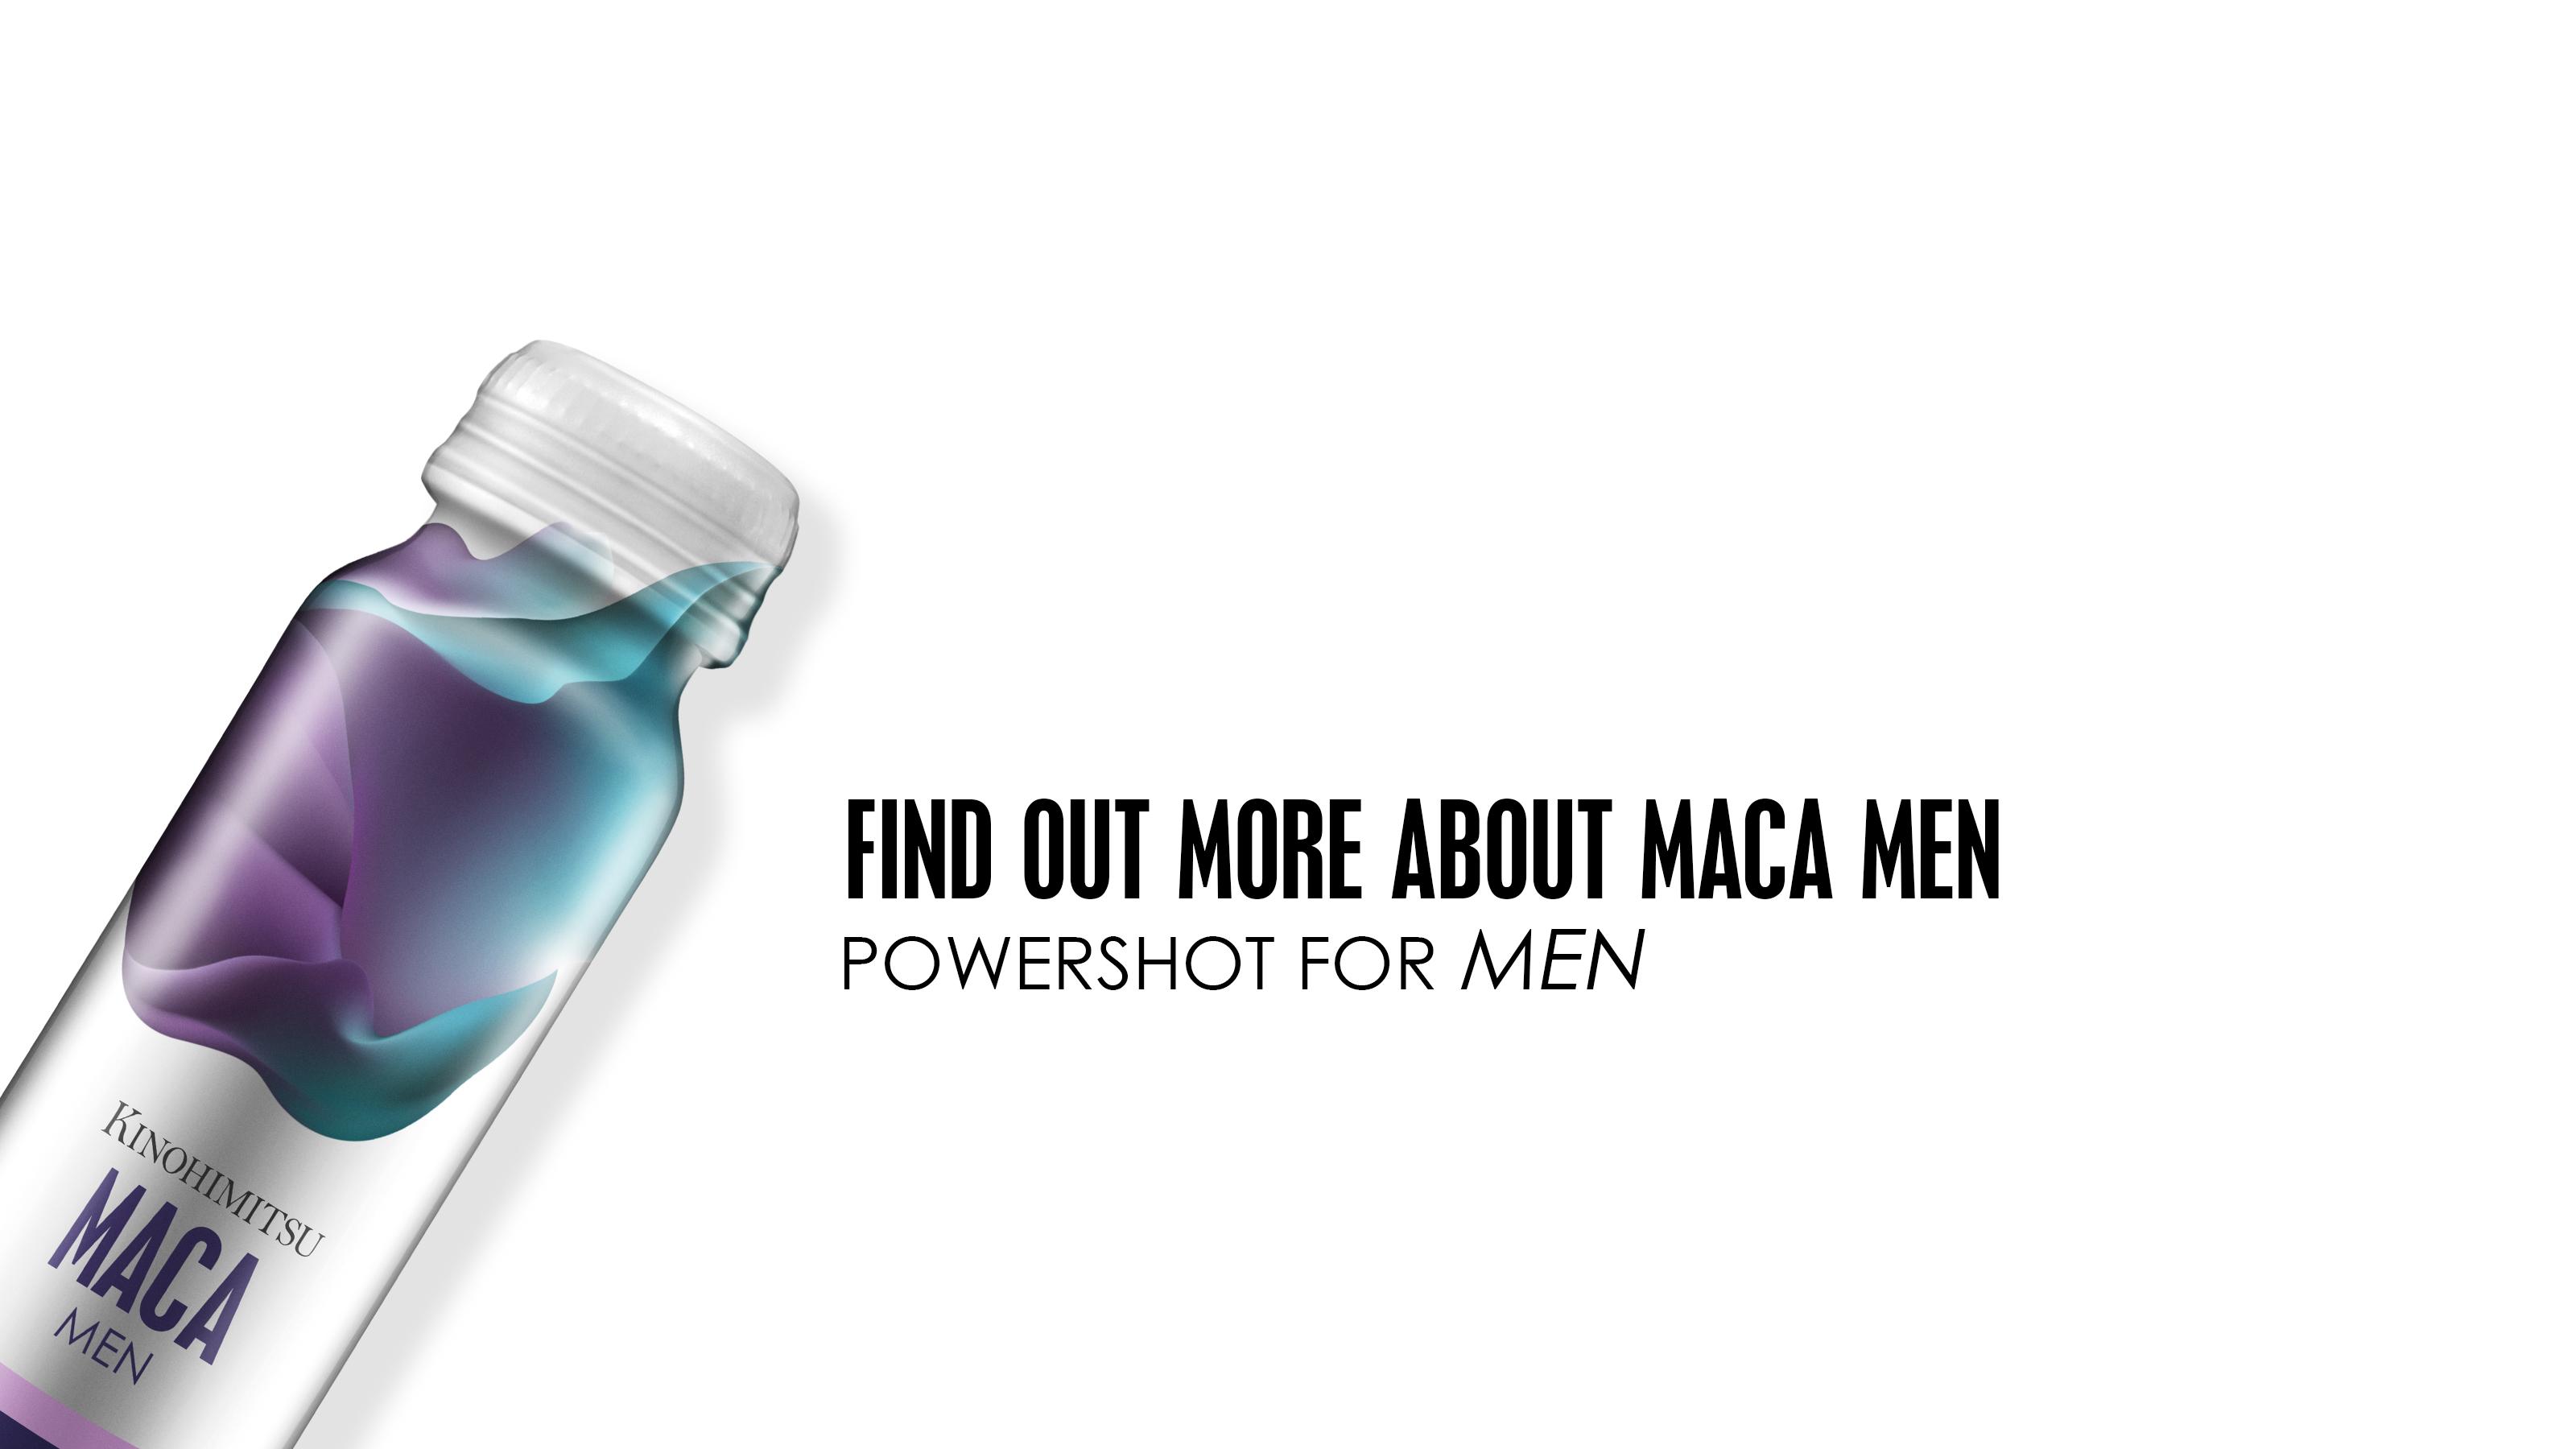 """The PowerShot For Men"""